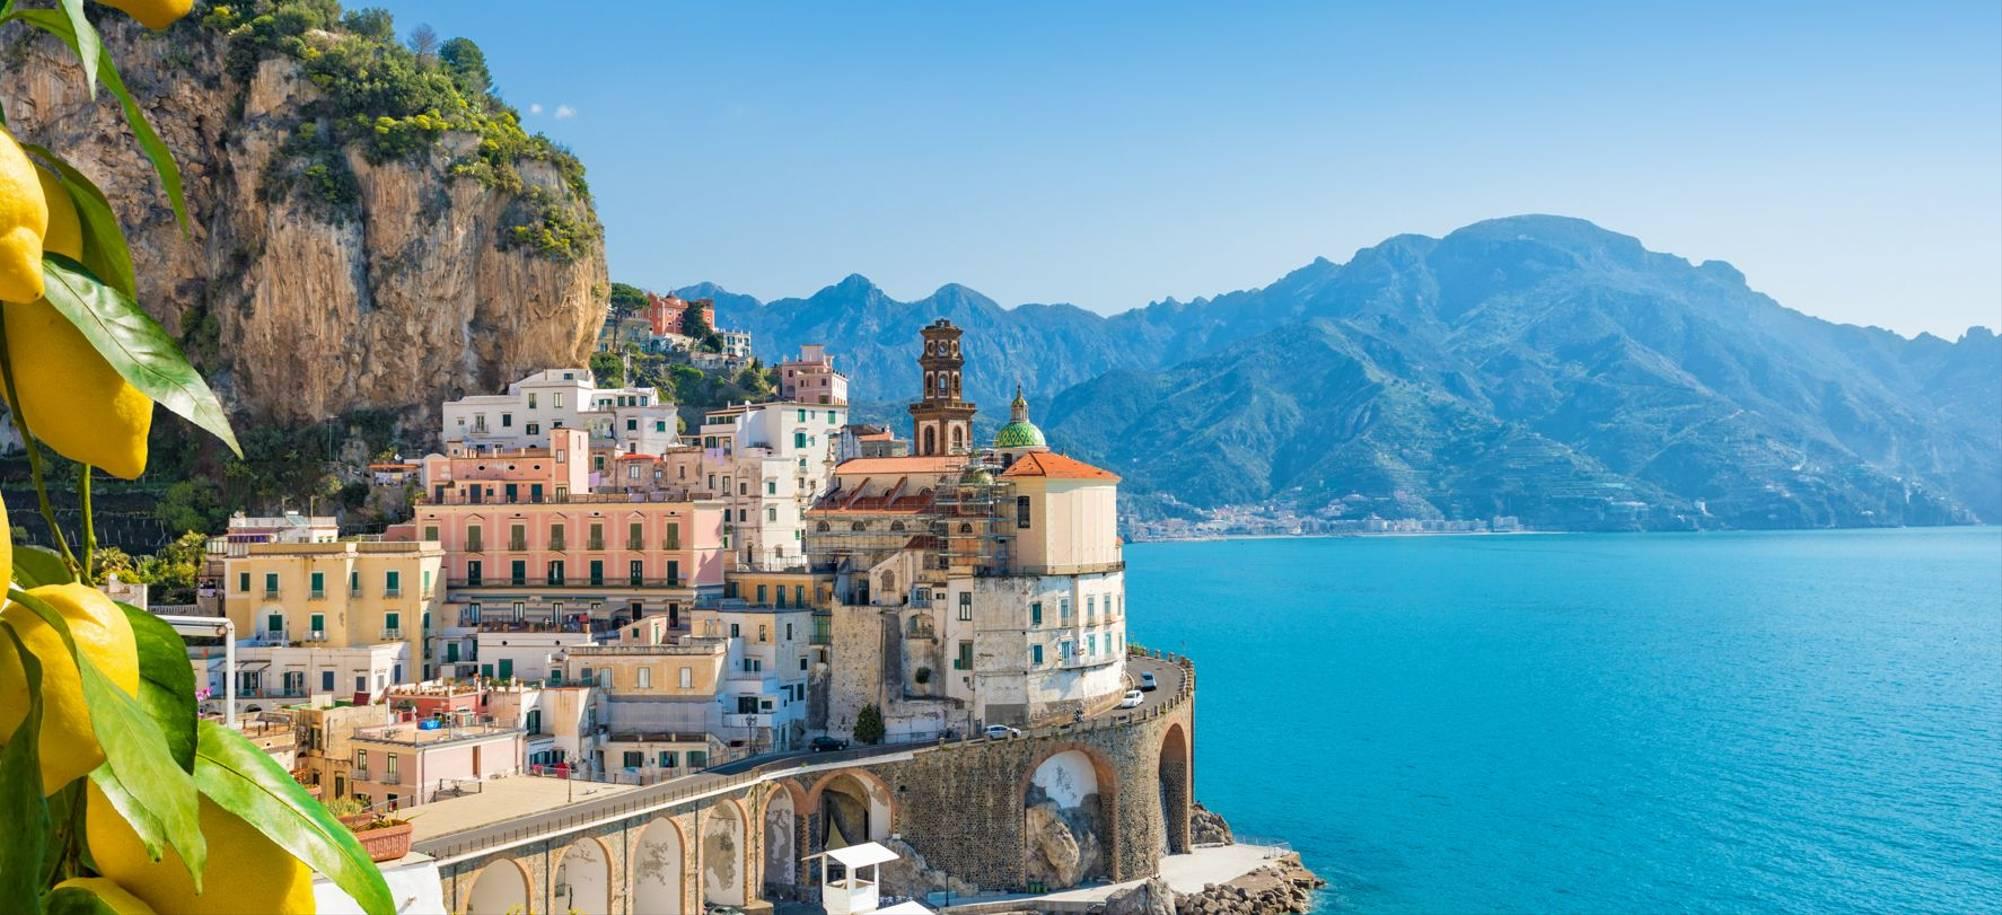 Salerno - Itinerary Desktop.jpg